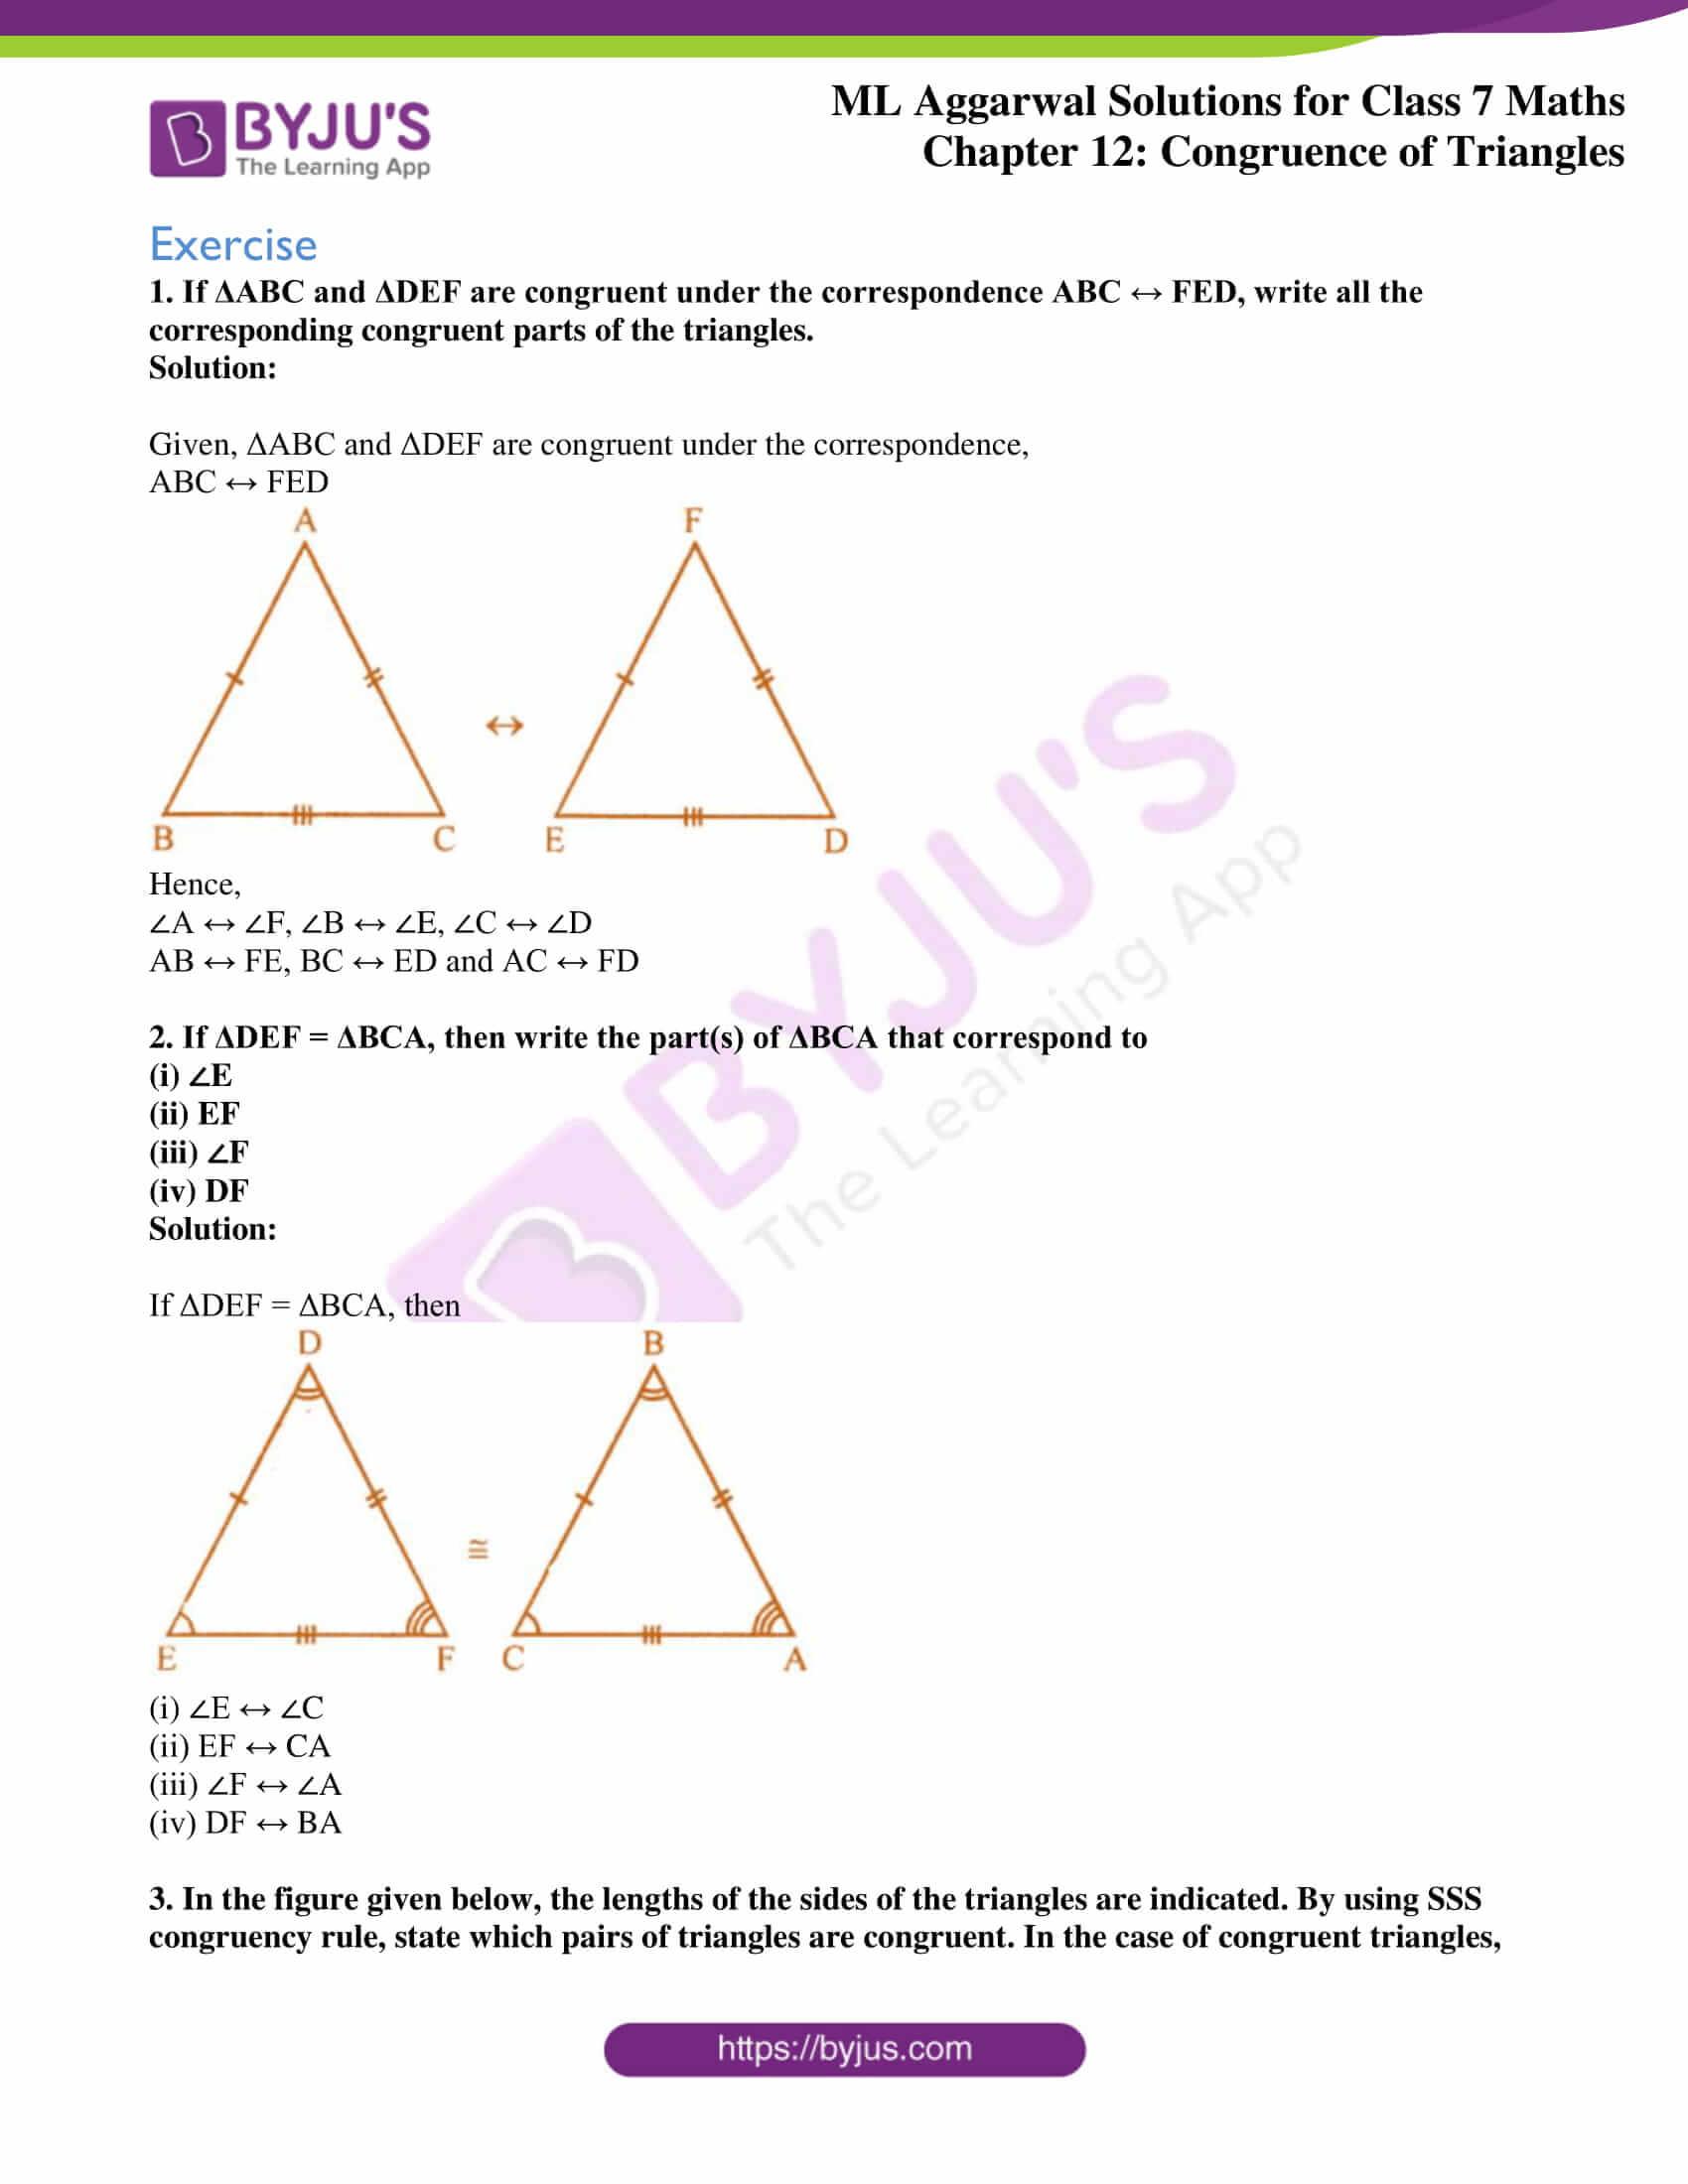 ml aggarwal sol class 7 maths chapter 12 1